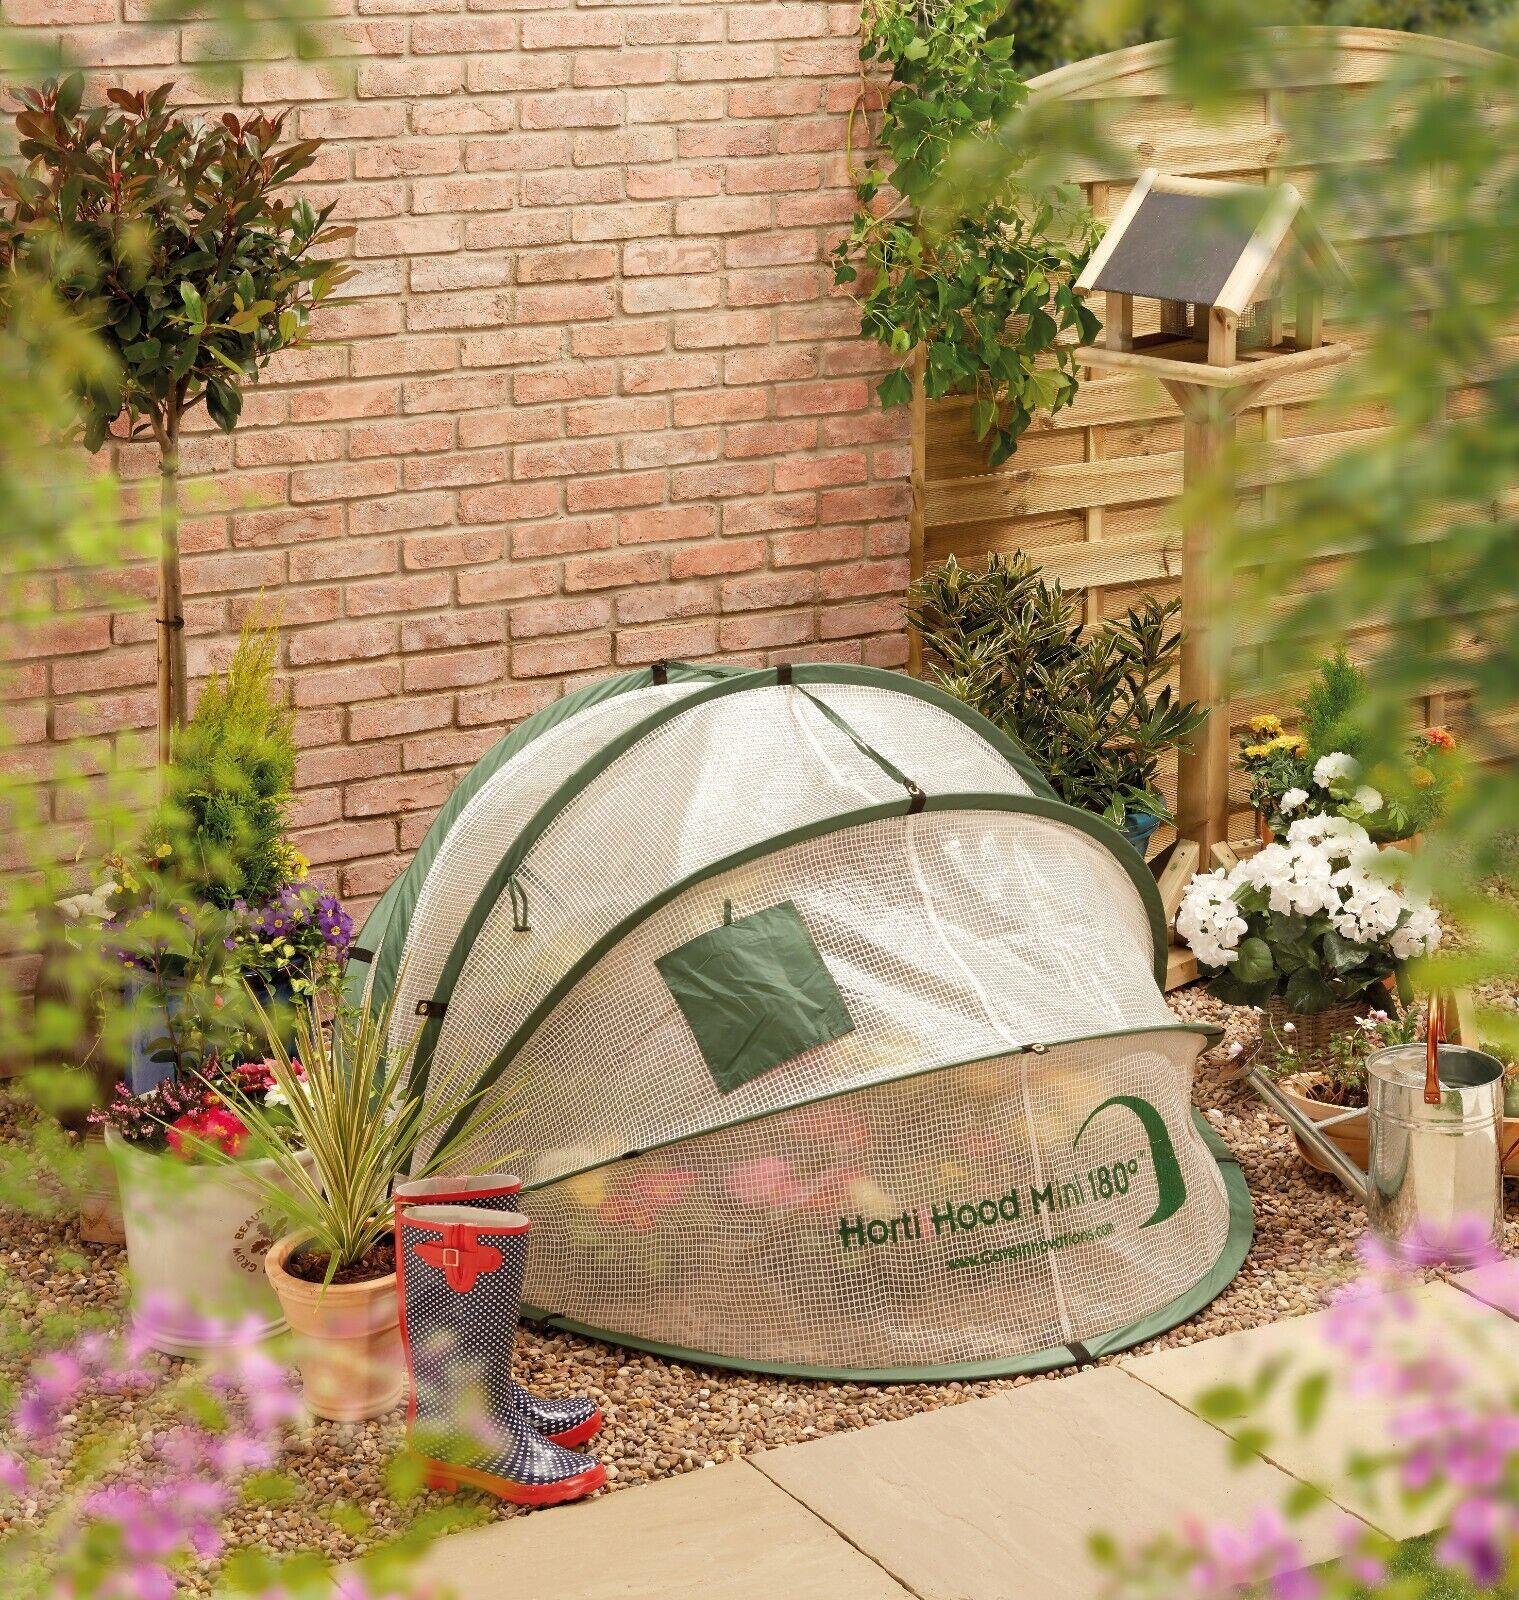 Horti Hood 180 Mini Wall-Mounted Folding PVC Cloche / HortiHood Mini Greenhouse